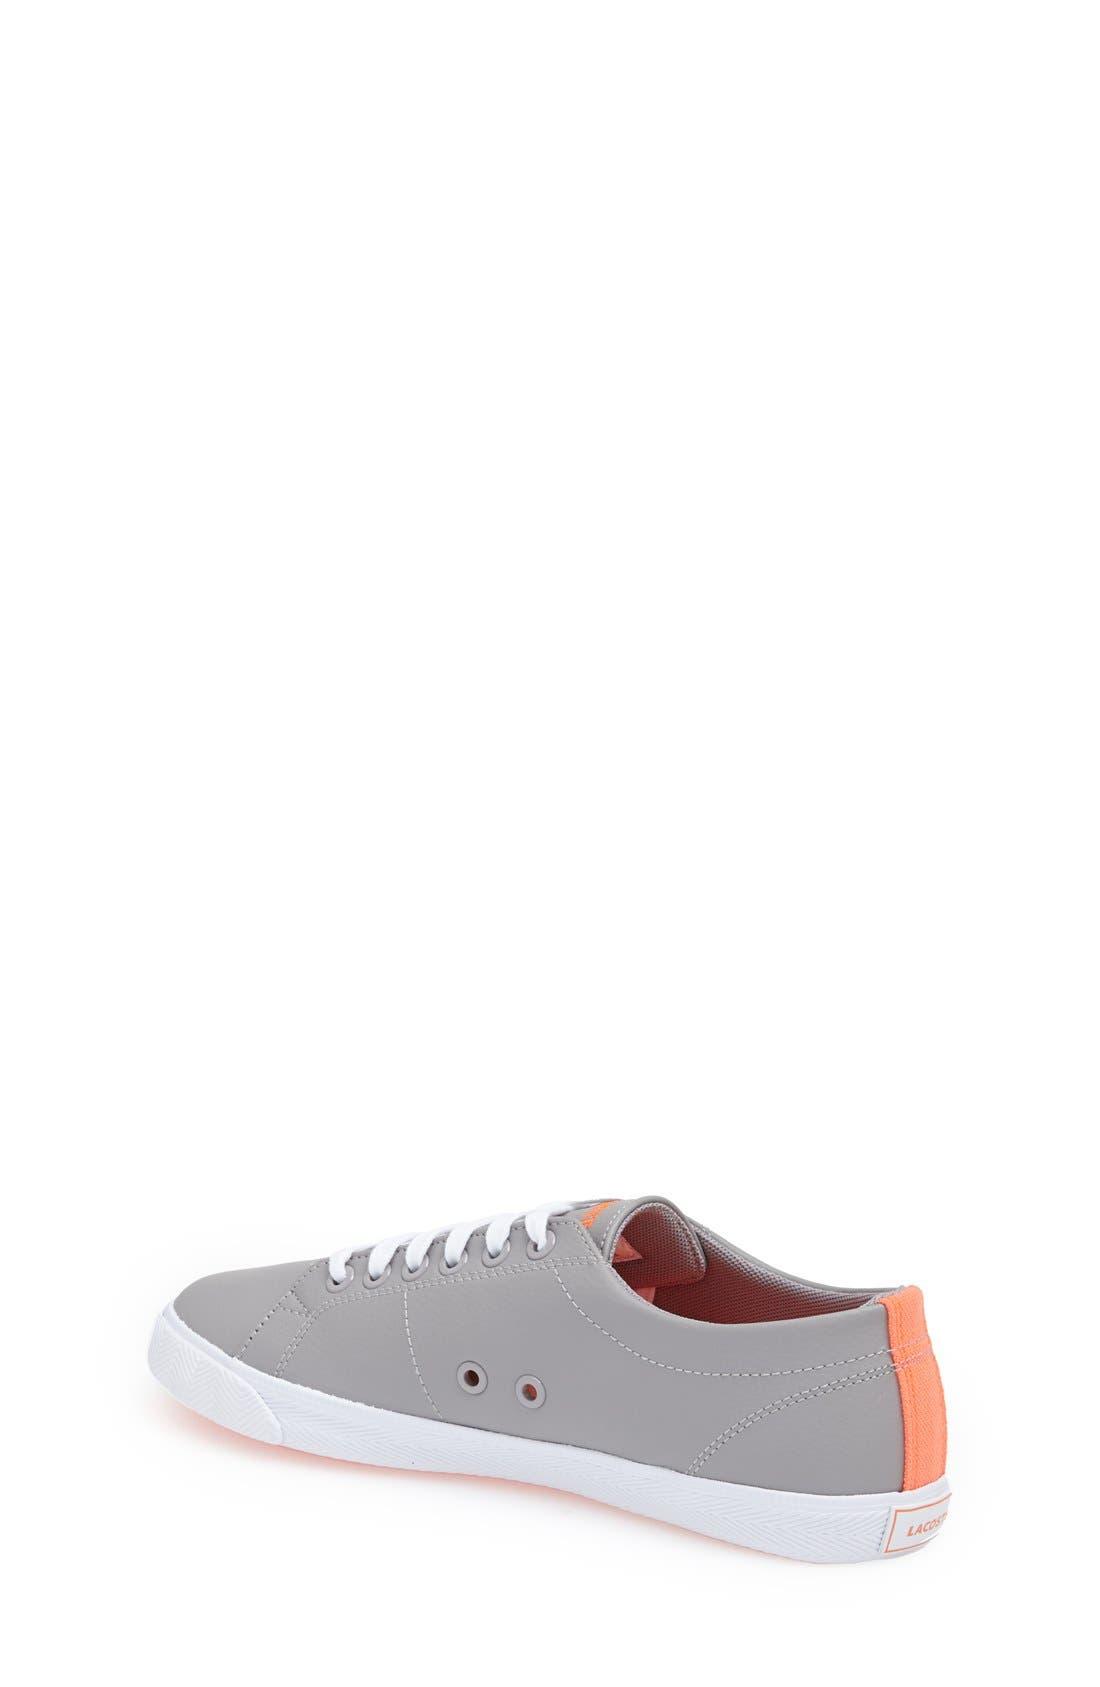 Alternate Image 2  - Lacoste 'Marcel' Sneaker (Toddler, Little Kid & Big Kid)